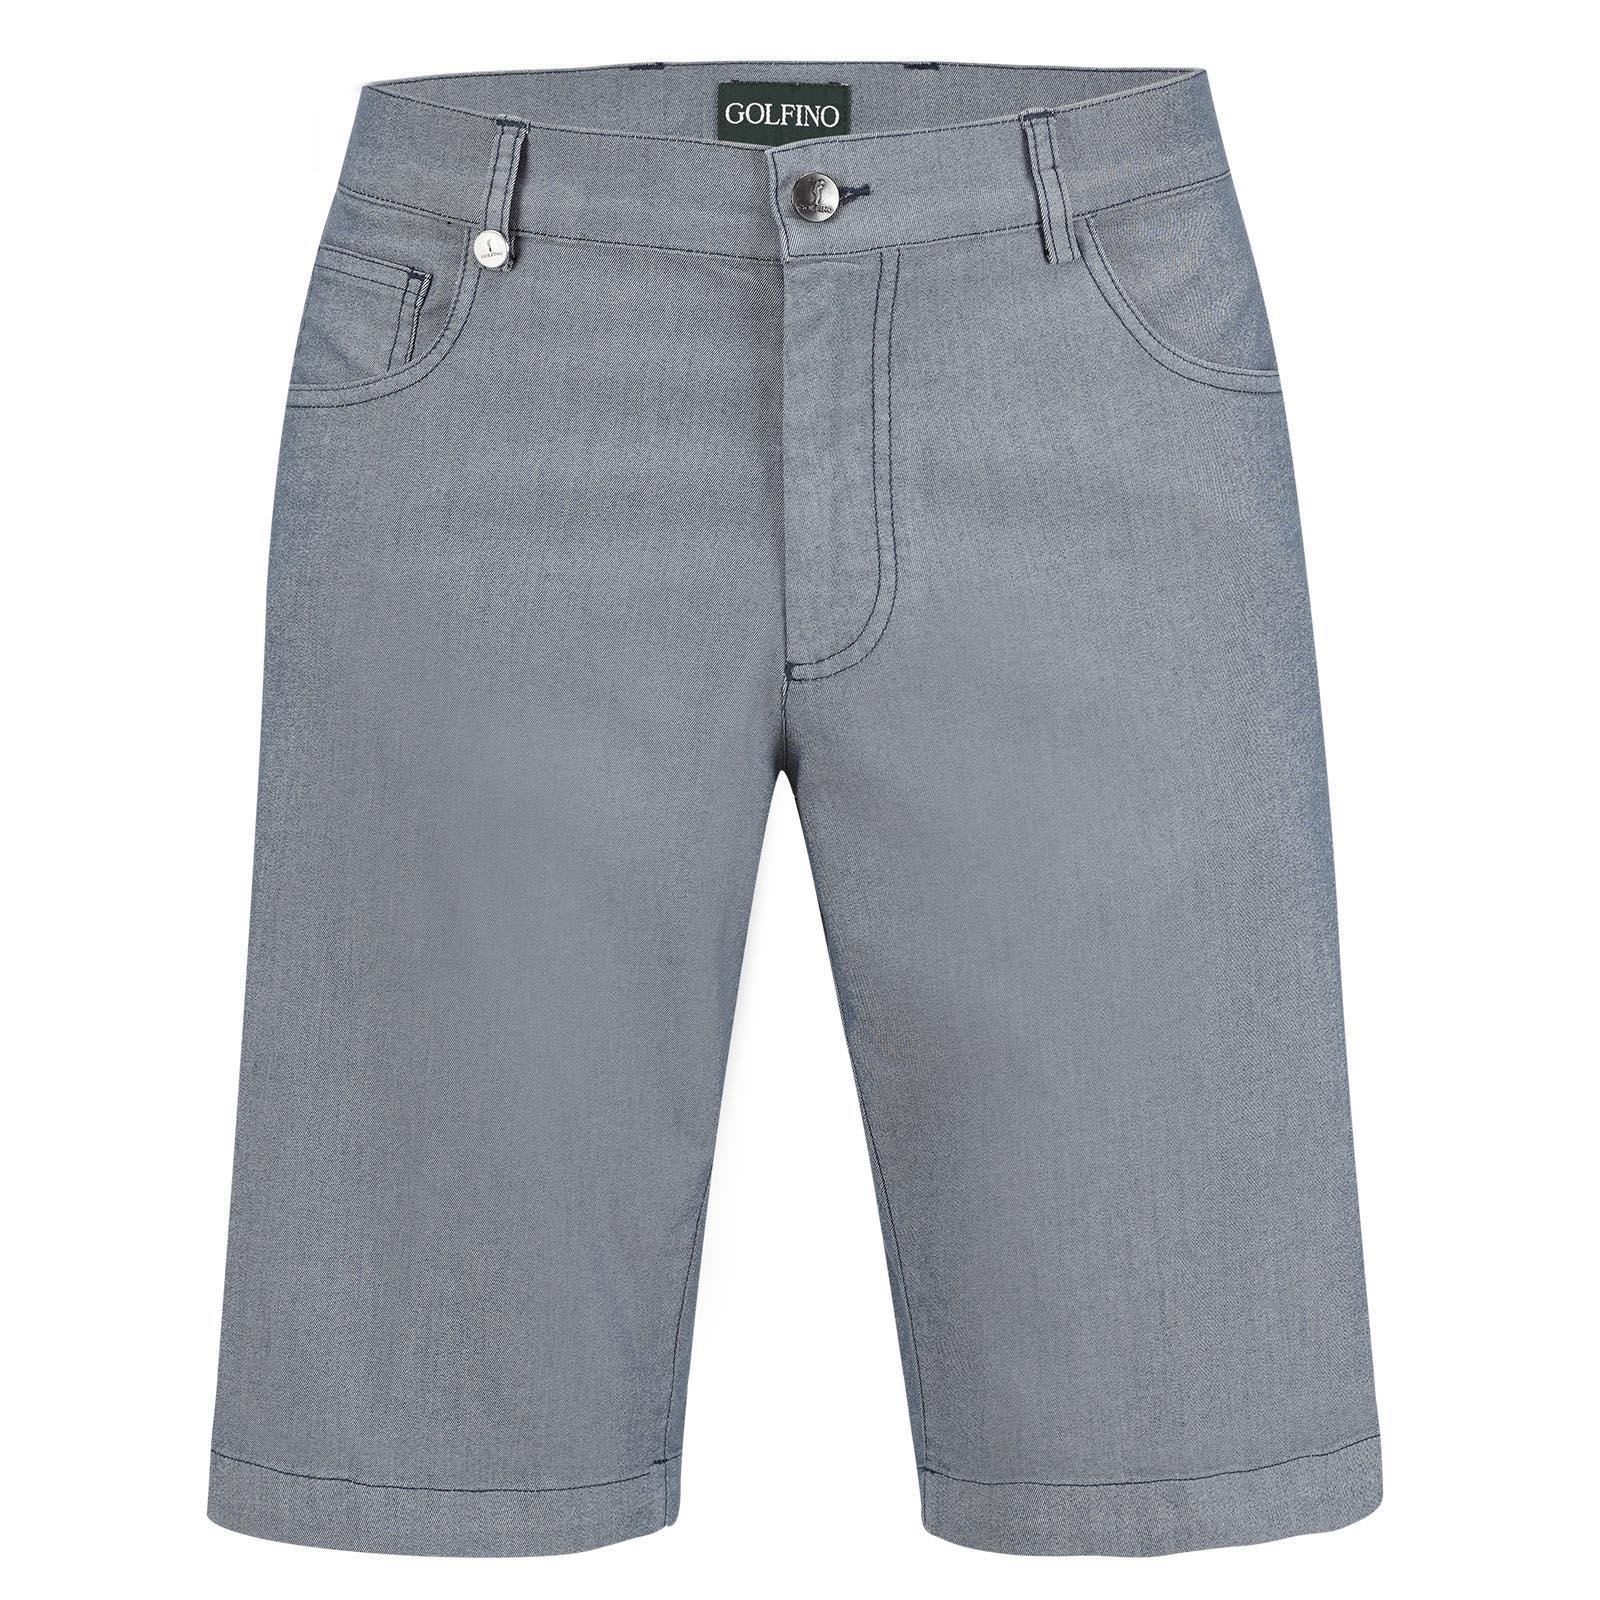 Men's Bermudas in five-pocket style